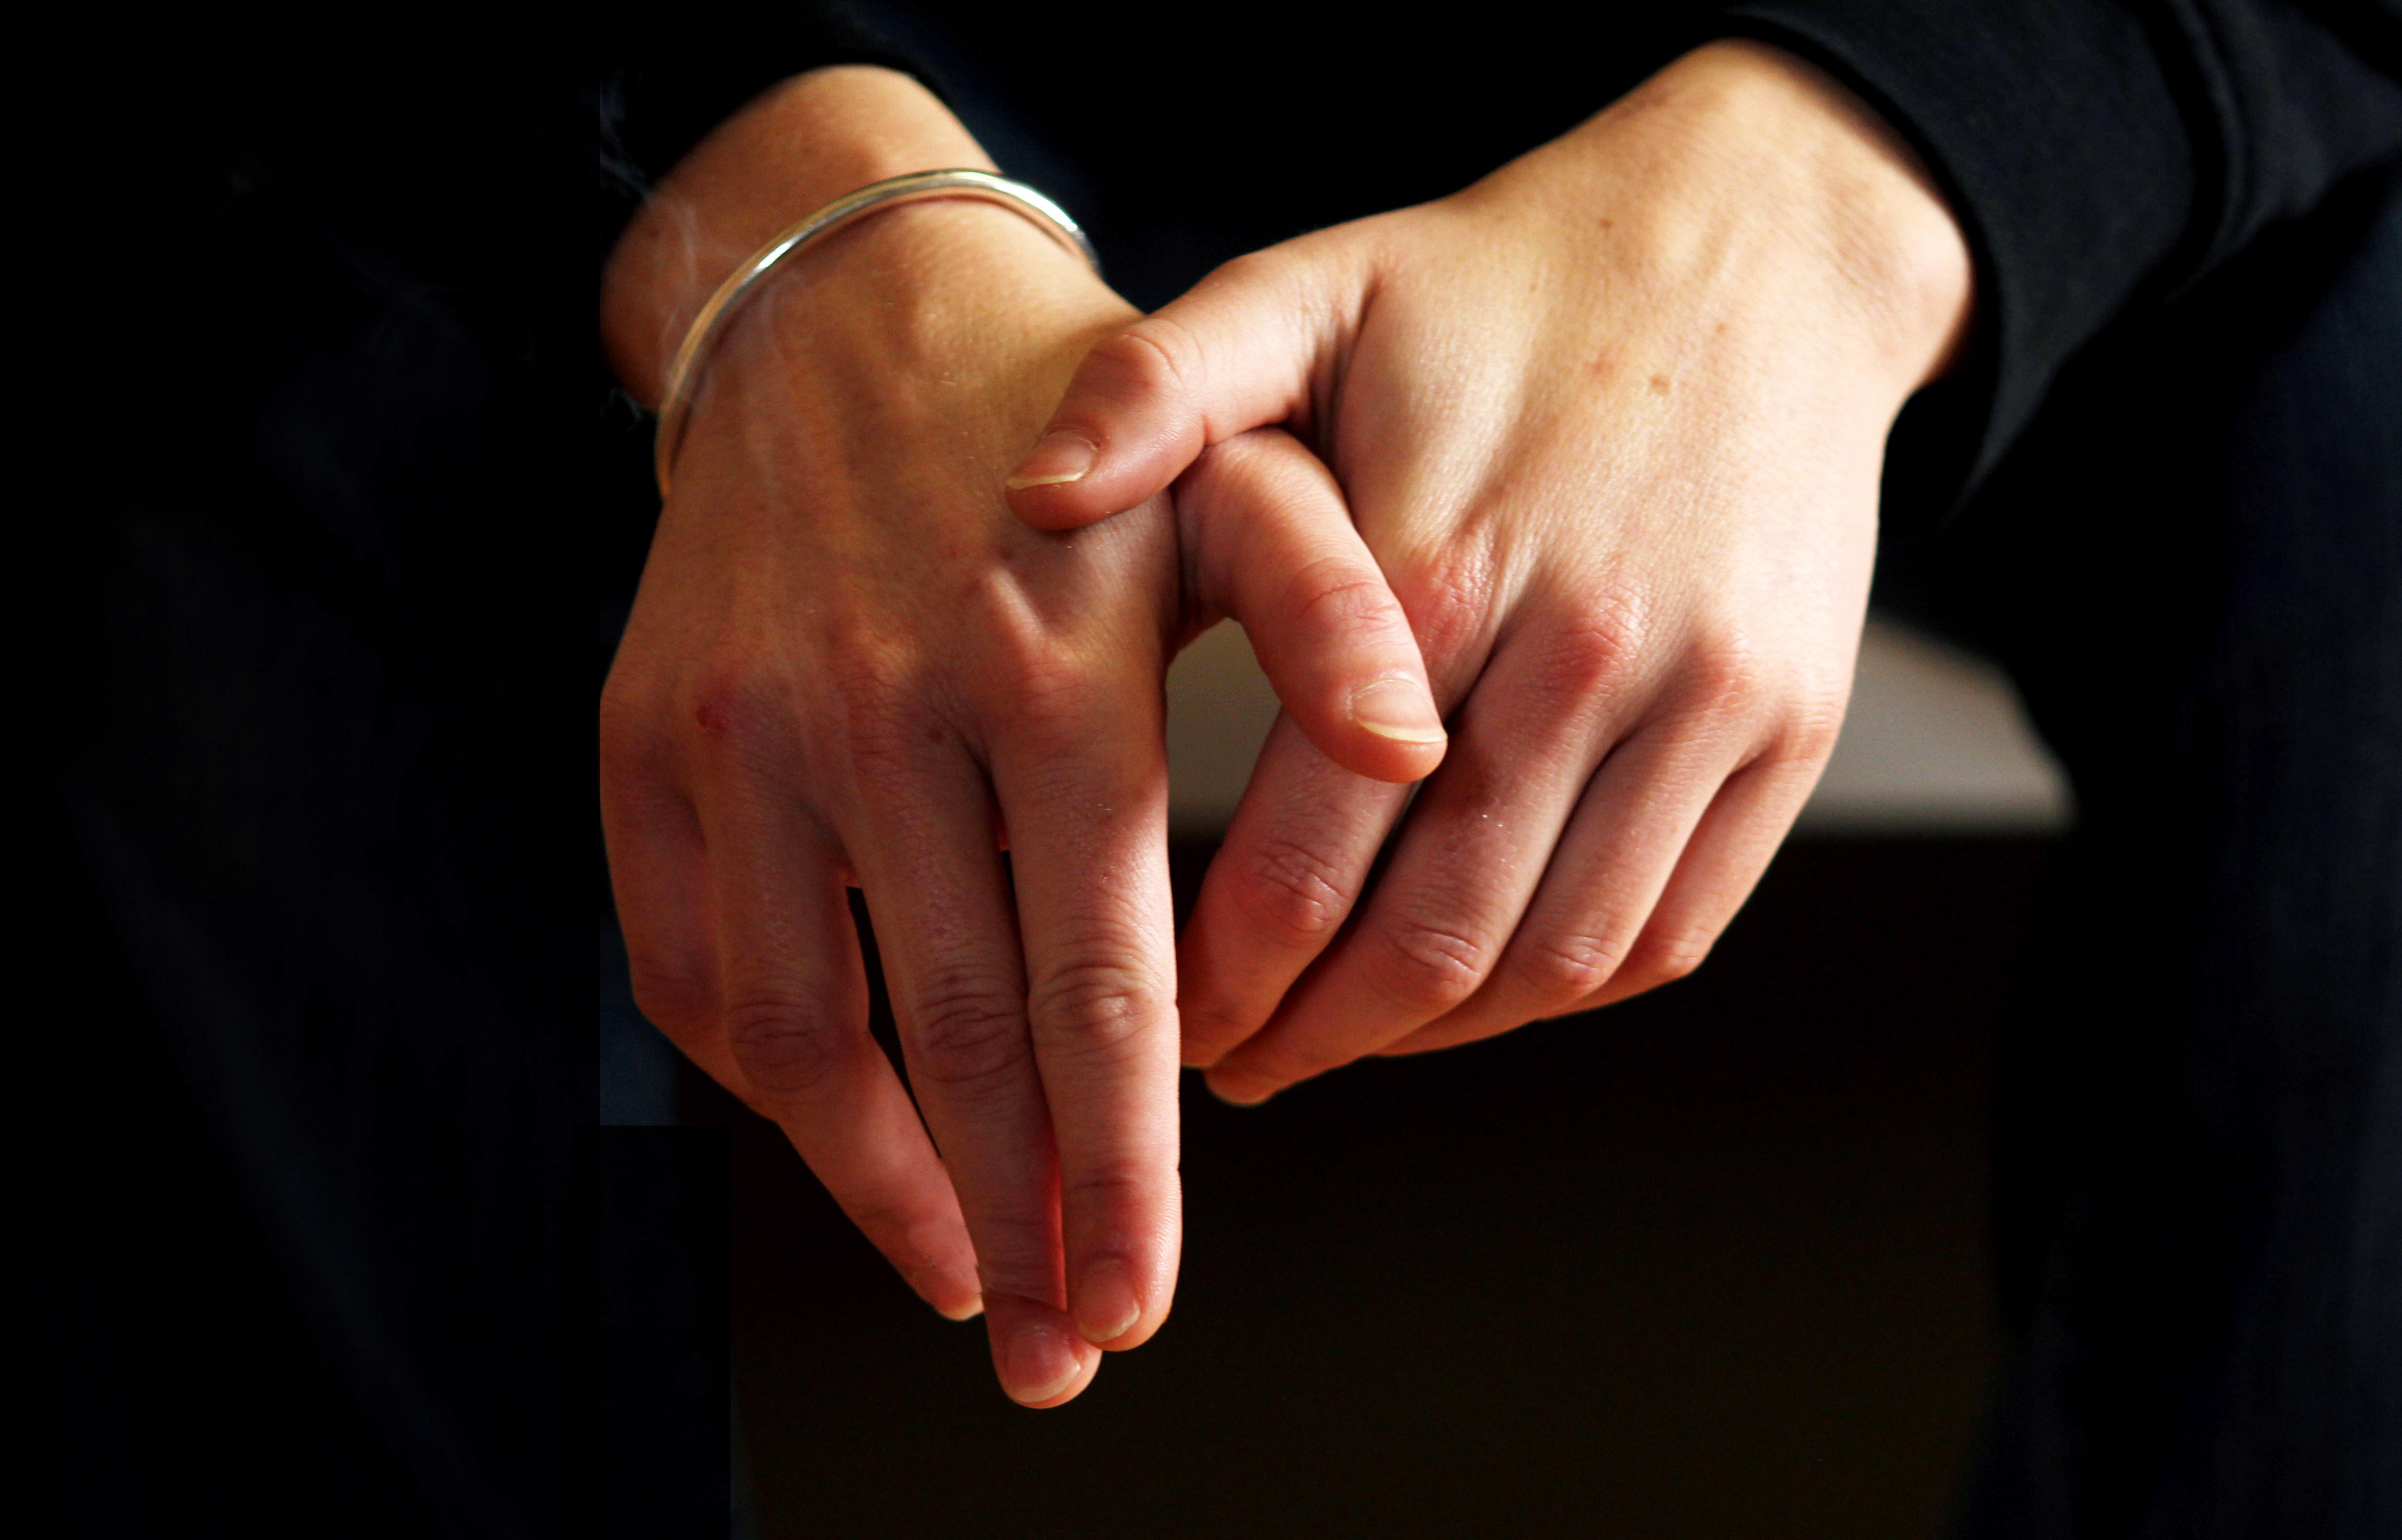 Mental health hands.jpg